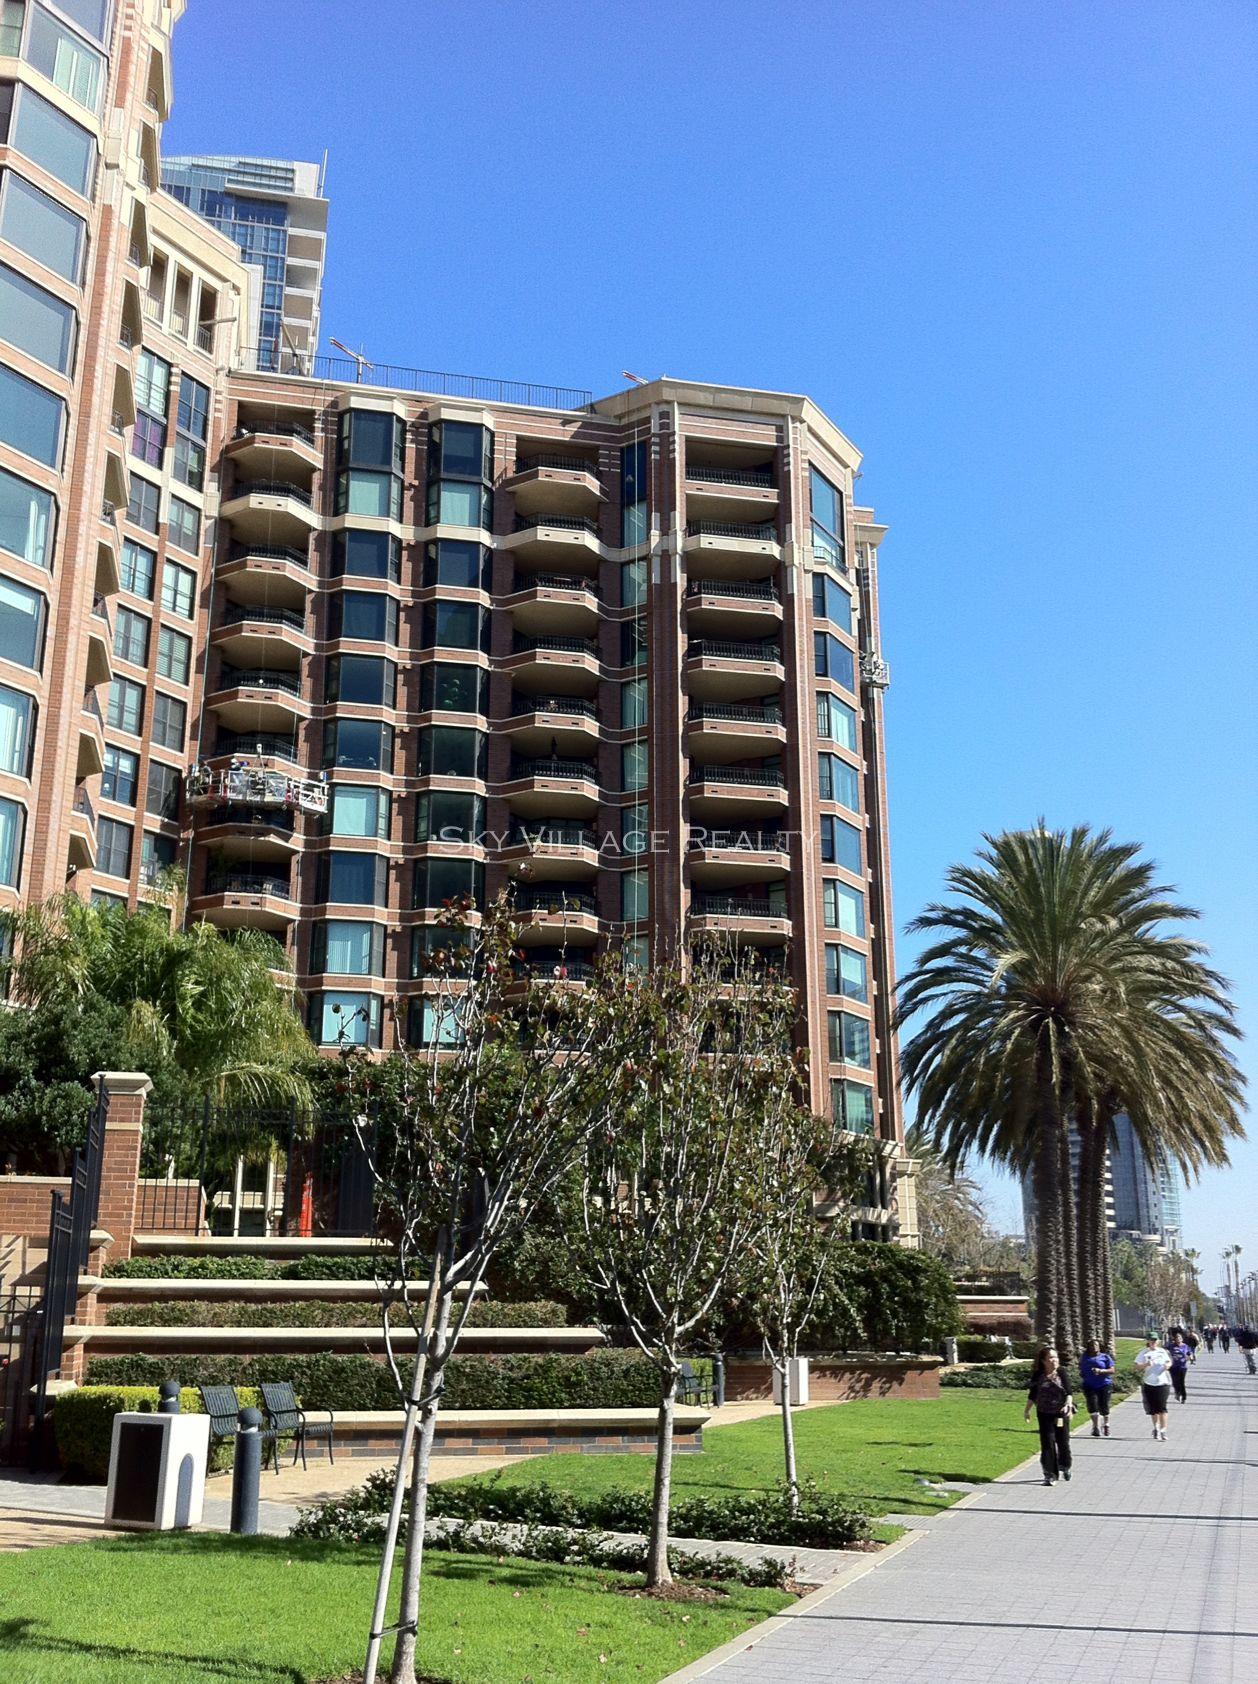 Cityfront Terrace Luxury Condos